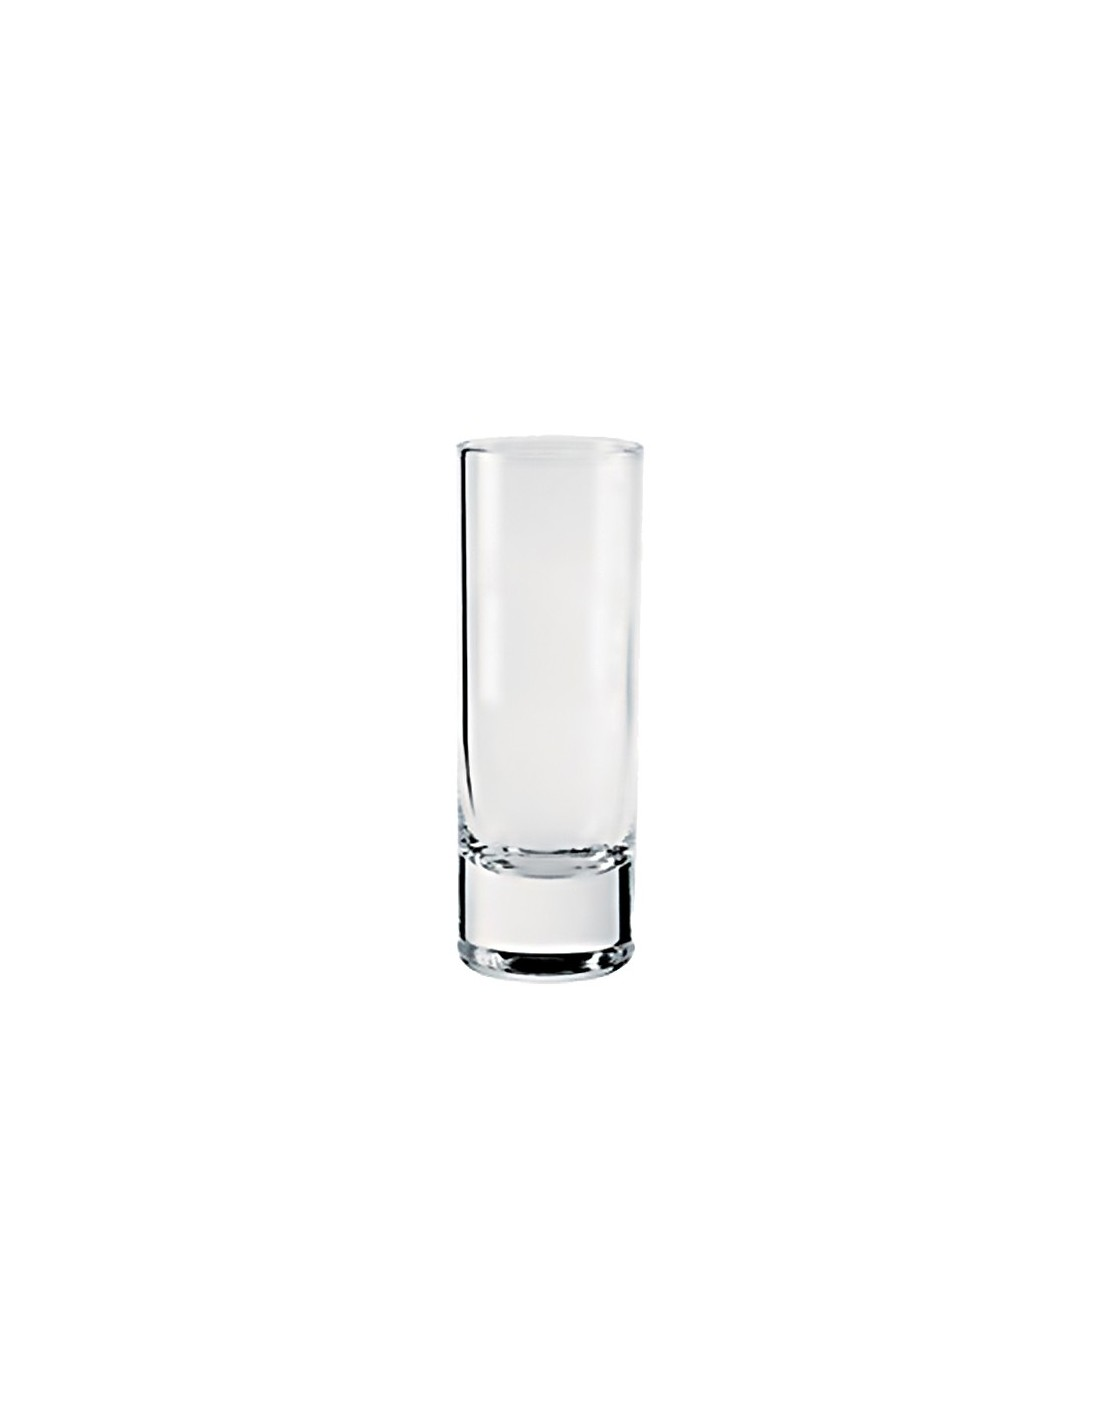 Vaso chupito indro vodka 3 8 x 10 5cm 60 ml 6 uds for Vaso chupito